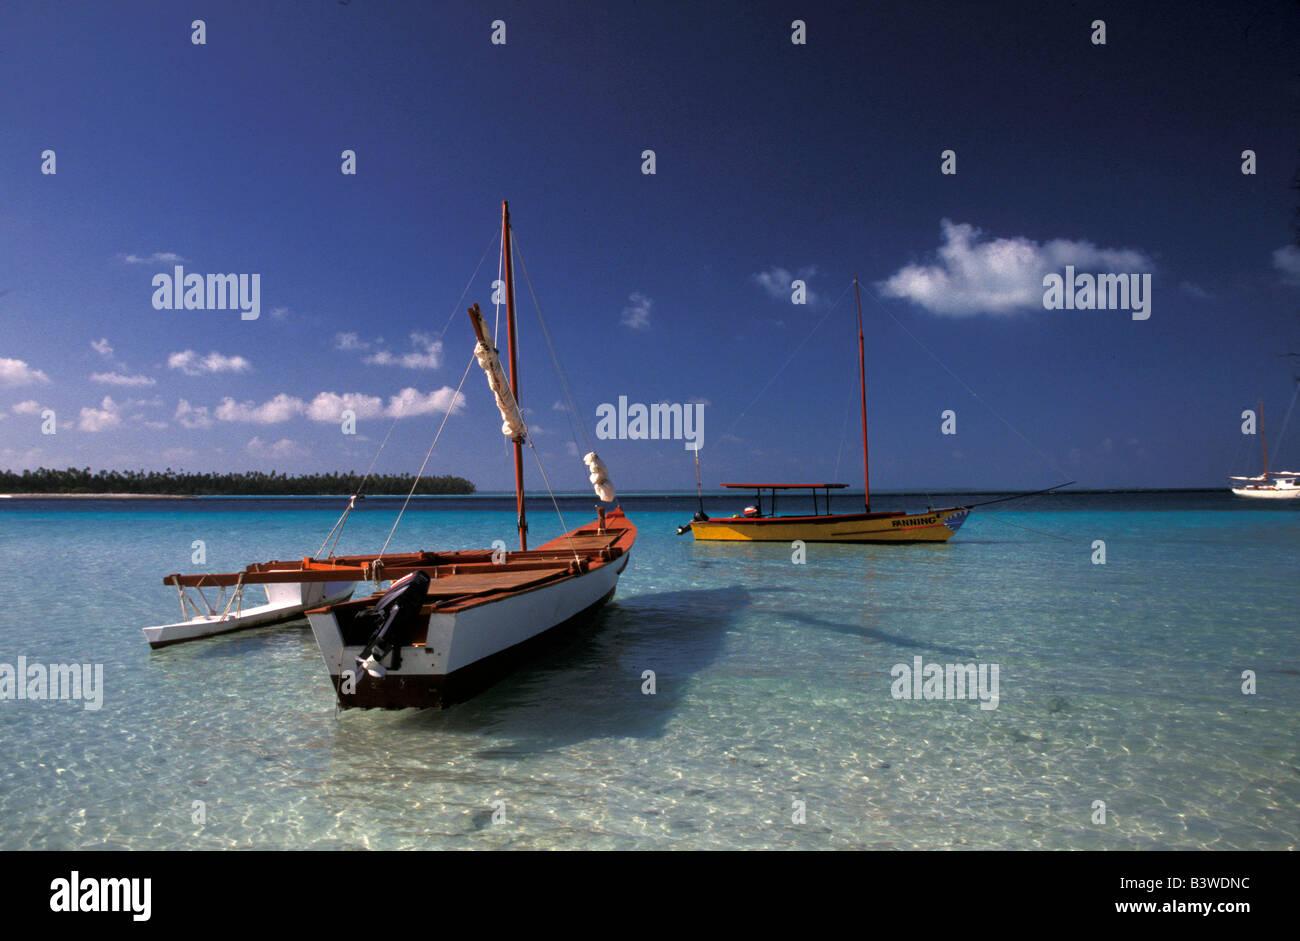 Oceania, Fanning Island, Kiribati. Sailboats, outrigger in harbor. - Stock Image